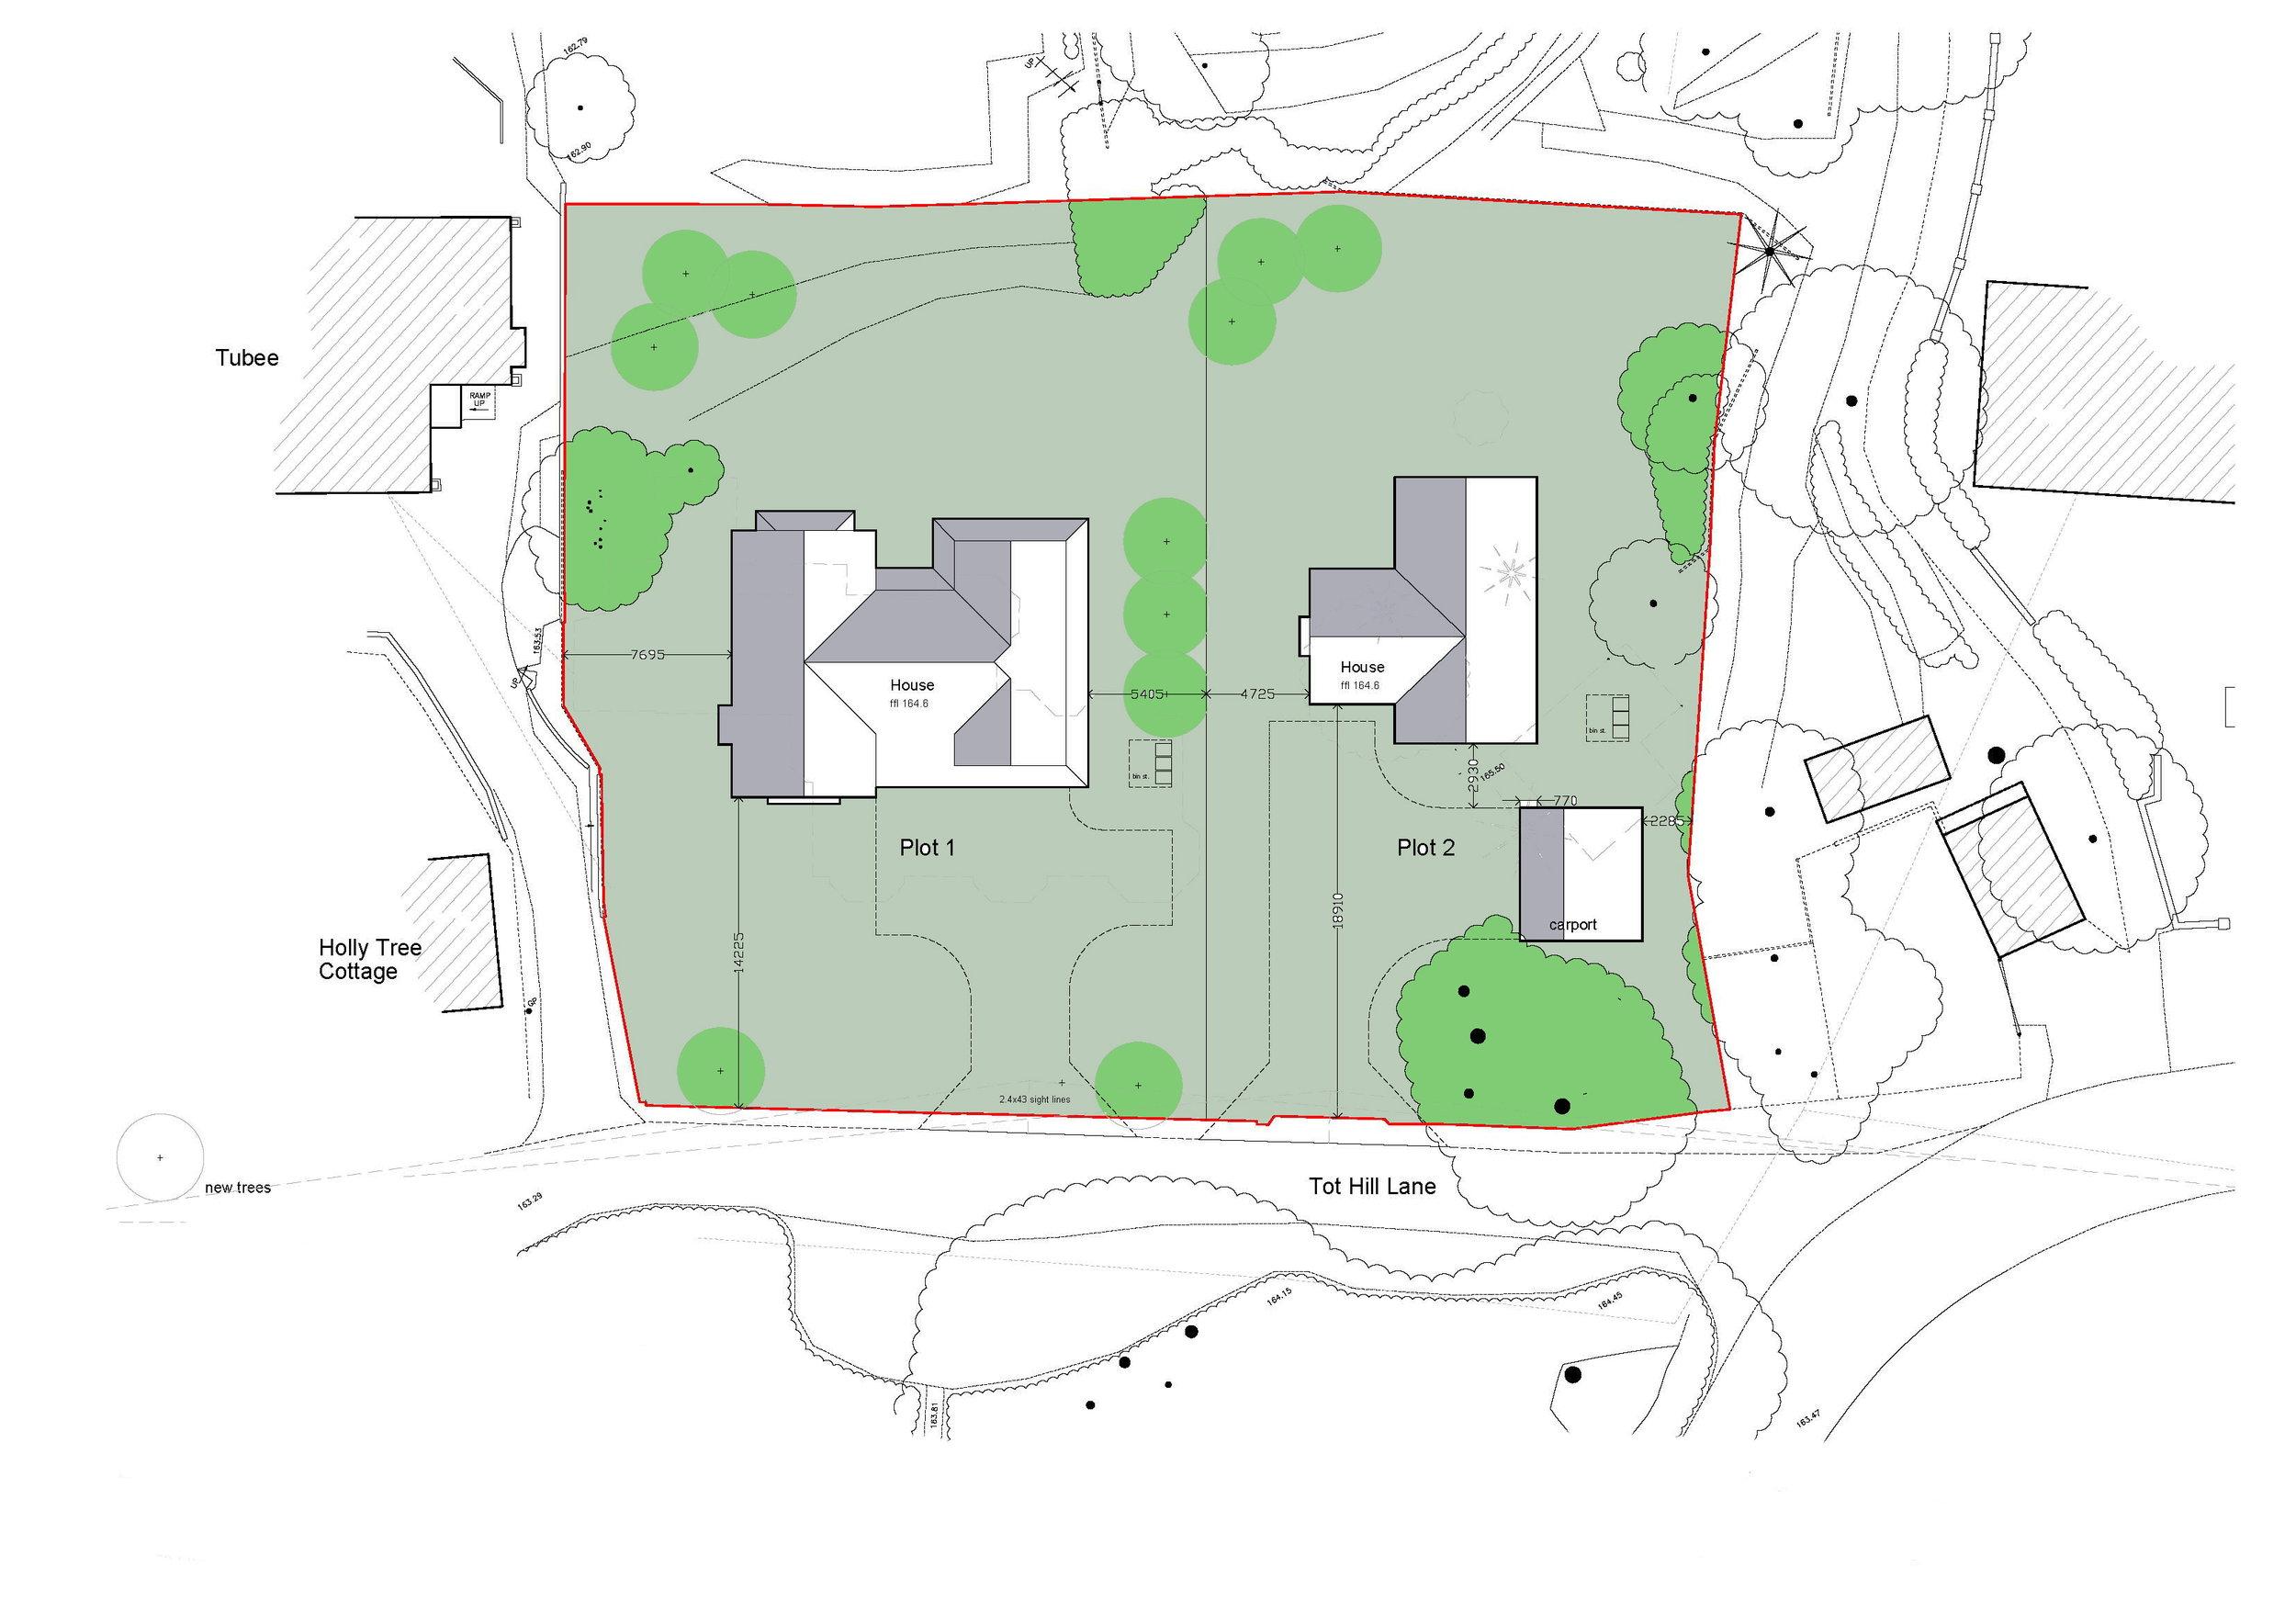 tunbarr site plan coloured 6 12 18.jpg